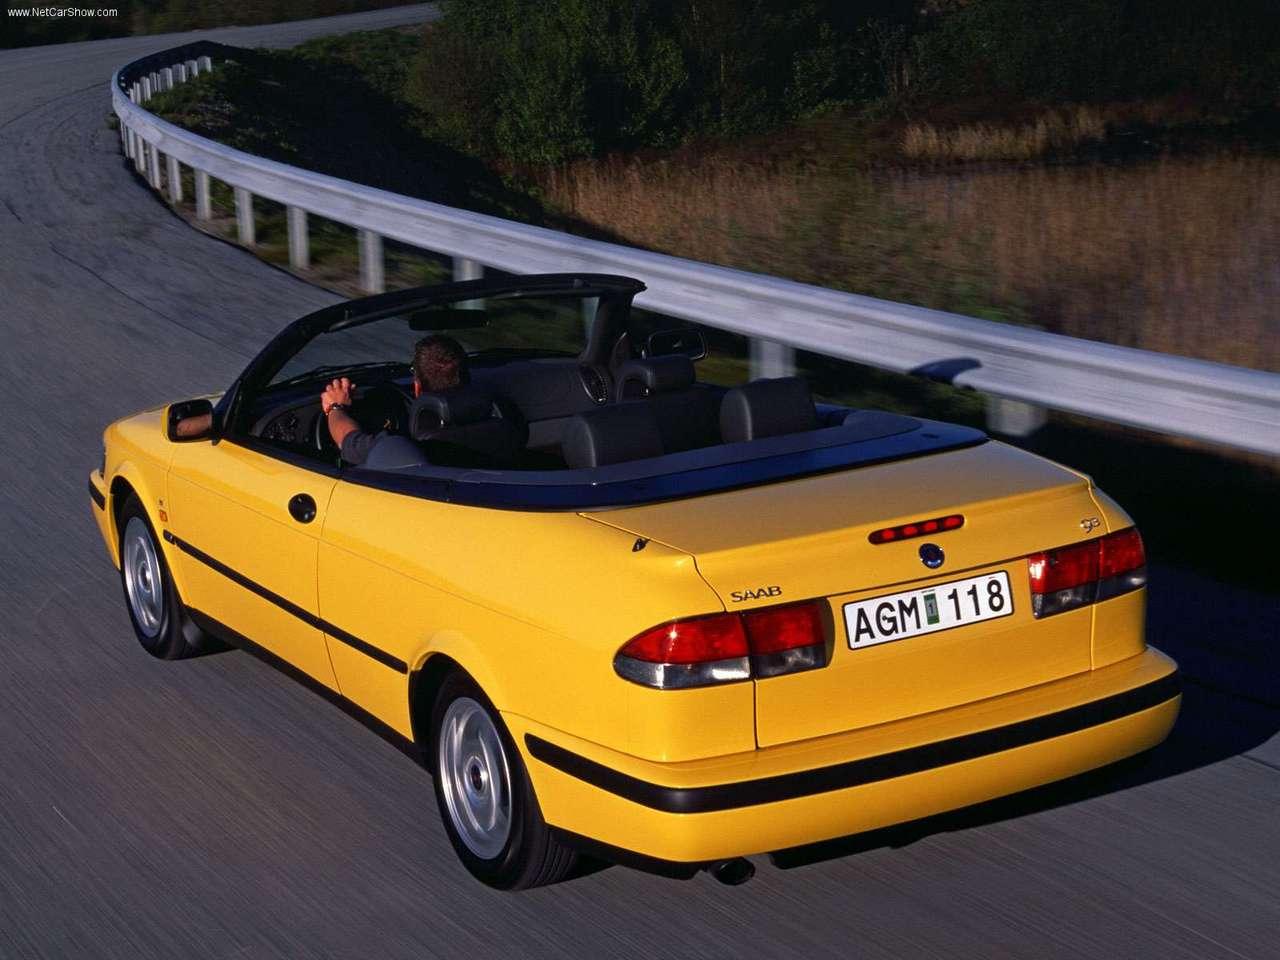 Saab 9-3 convertible, Saab 9-3 cabriolet, Saab 93, 9-3, 93, Saab, Sweden, Swedish, motoring, automotive, car, classic car, retro car, cool car, very yellow car, ebay, ebay motors, autotrader, car, cars, Volvo, GM, Vauxhall, Vauxhall Vectra